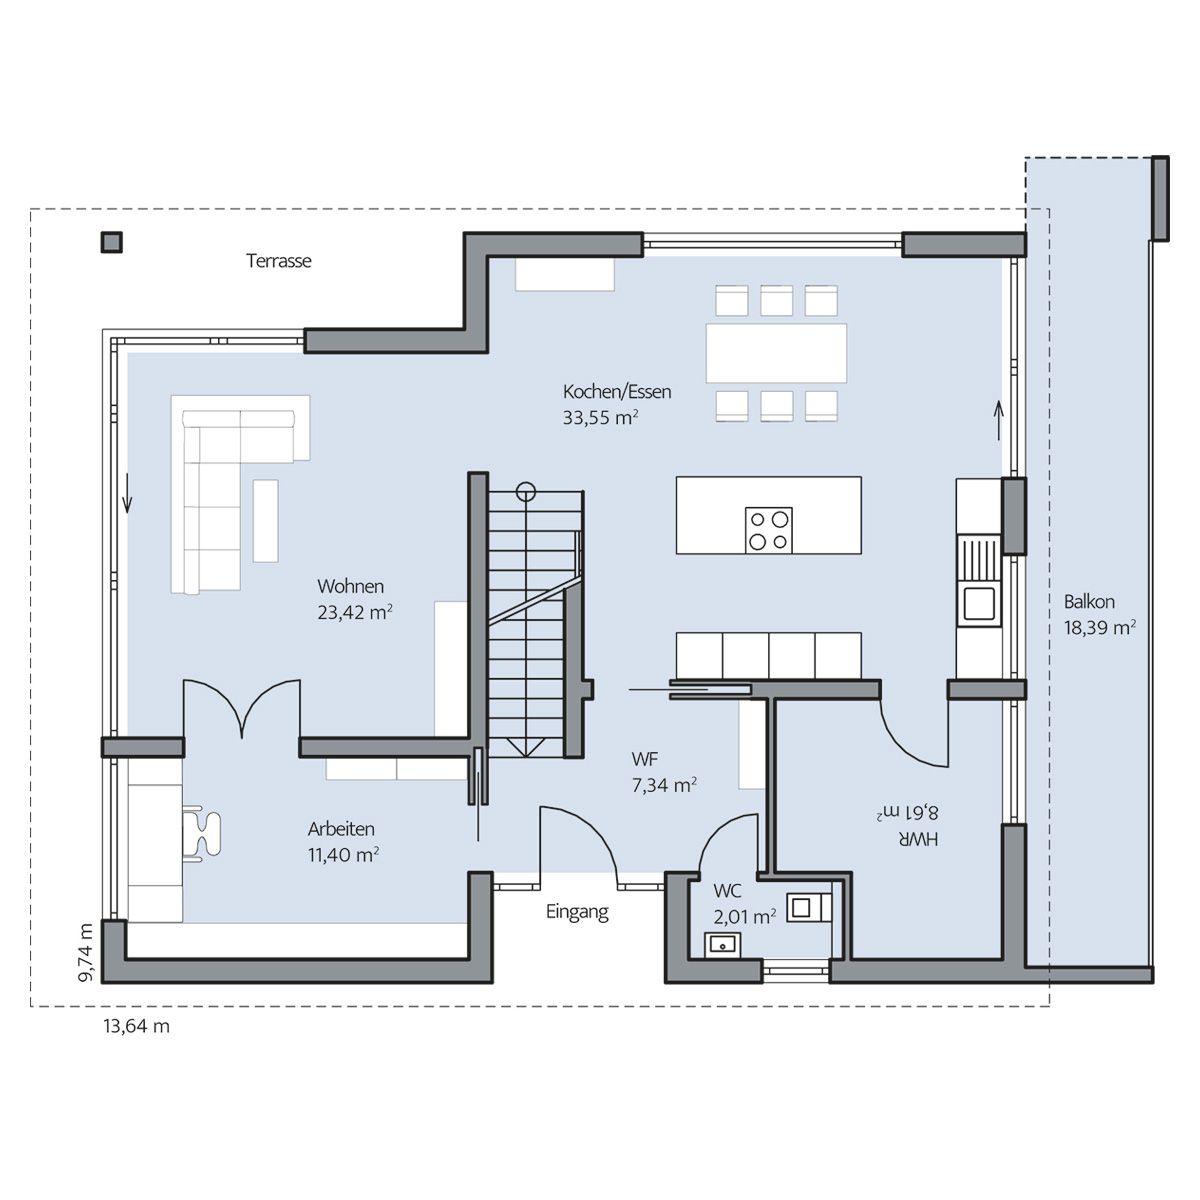 Haus Plane Erdgeschoss Hauser In 2019 Haus Grundriss Grundriss